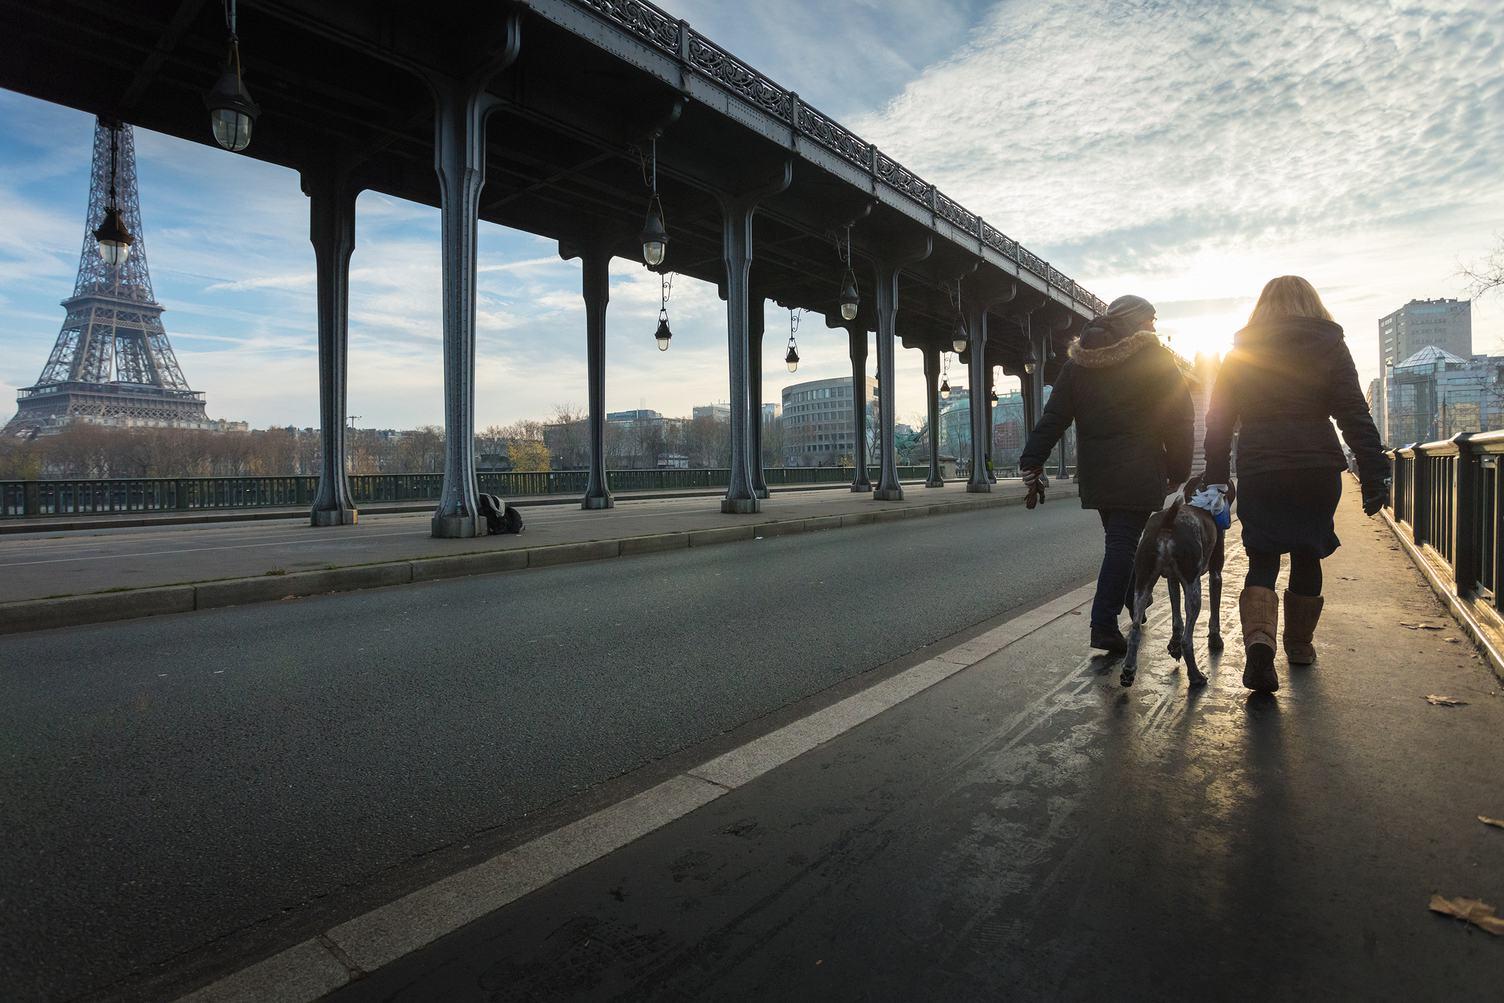 Eiffel Tower and Bir Hakeim Bridge in Paris, Couple Walking with Dog